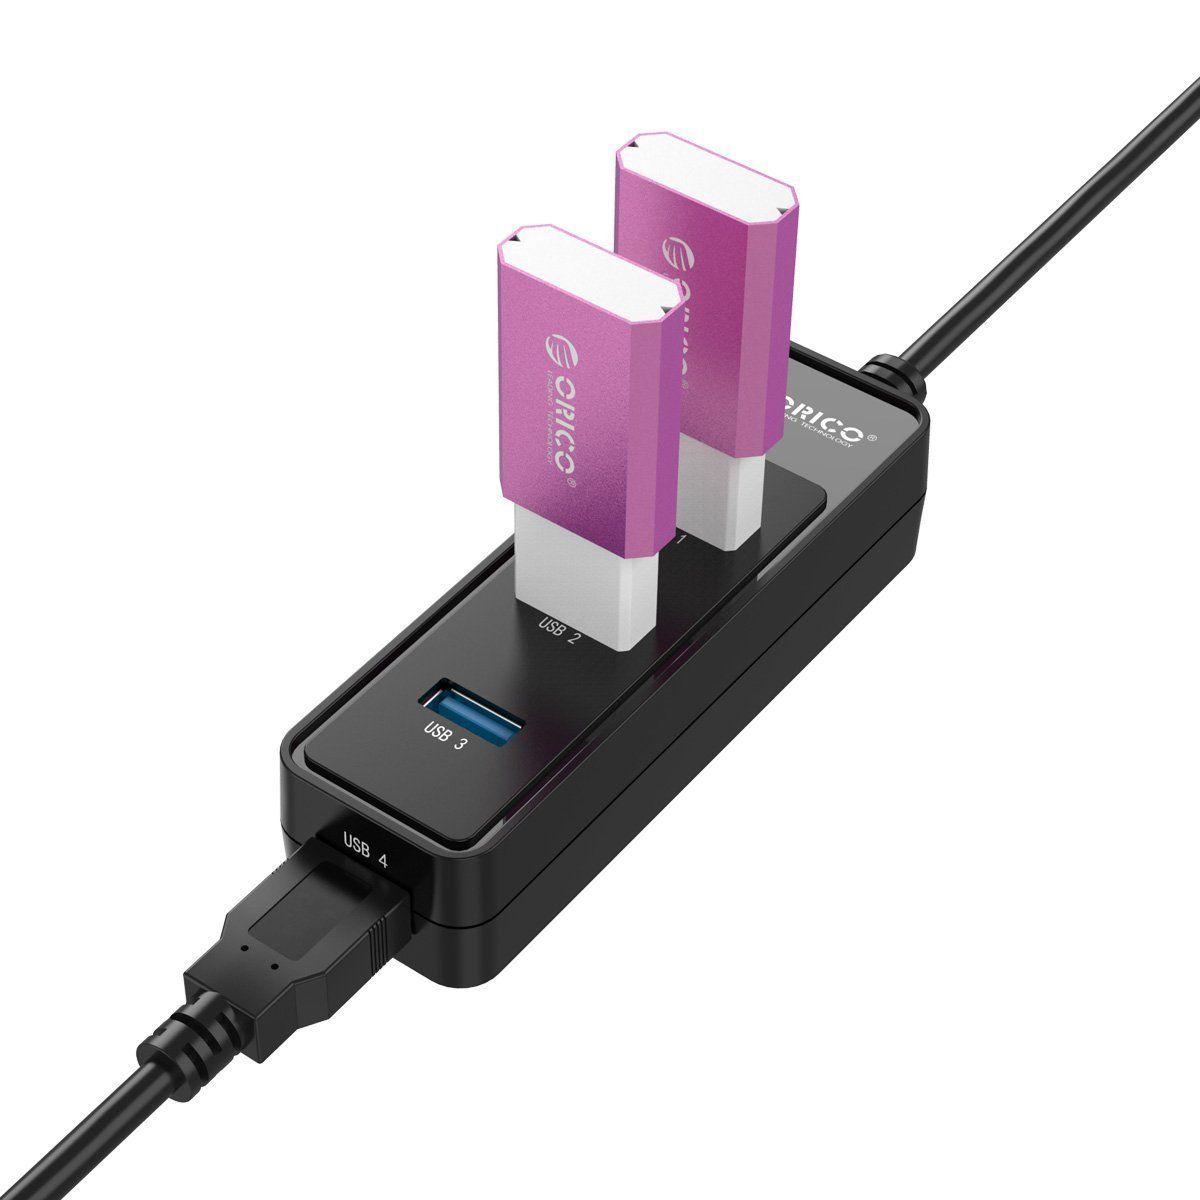 Caricabatterie Striscia Orico USB 3.0 MOZZO SuperSpeed 4 Port USB HUB divisore 1x4 di espansione USB portatile iPhone 6 Plus / Samsung / iPad